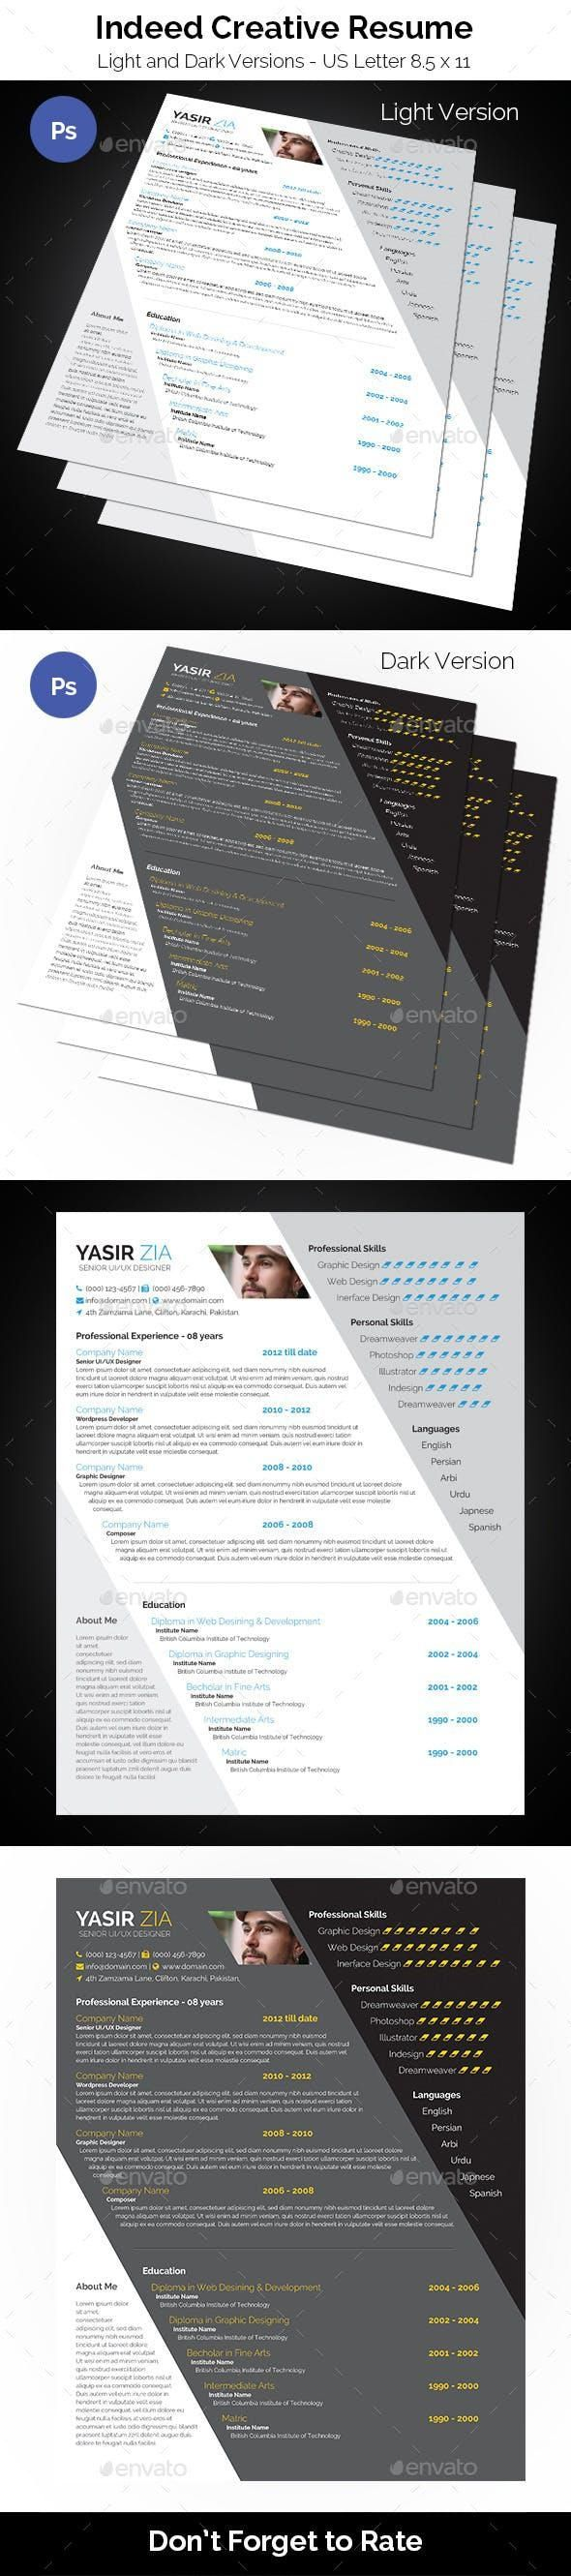 Indeed Creative Resume Creative resume, Creative resume